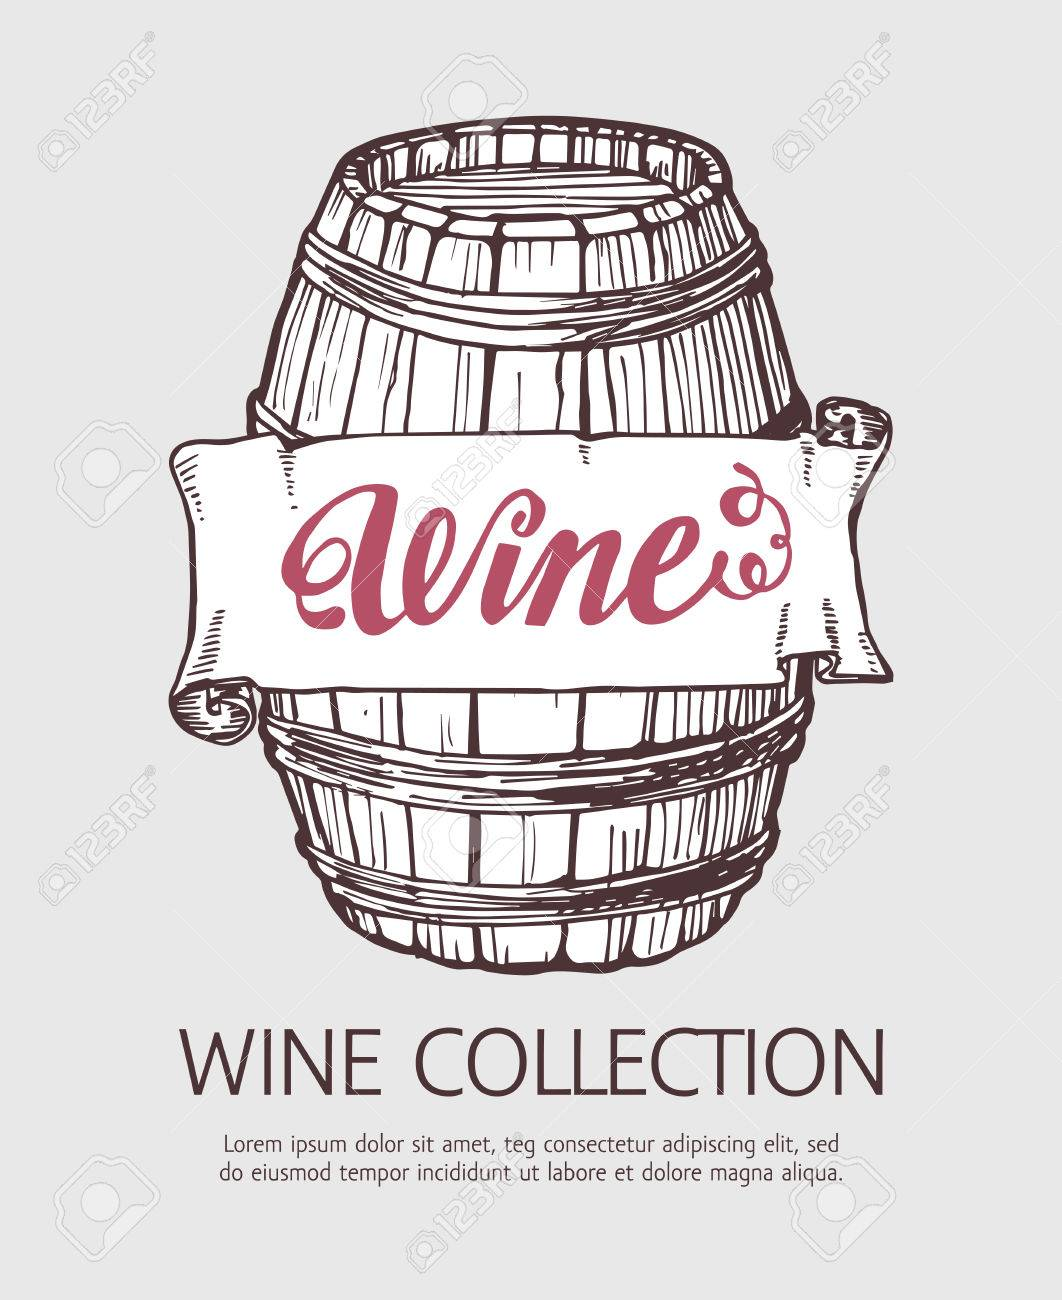 Wine Or Beer Wood Barrel. Handdrawn Vector Sketch Template With ...